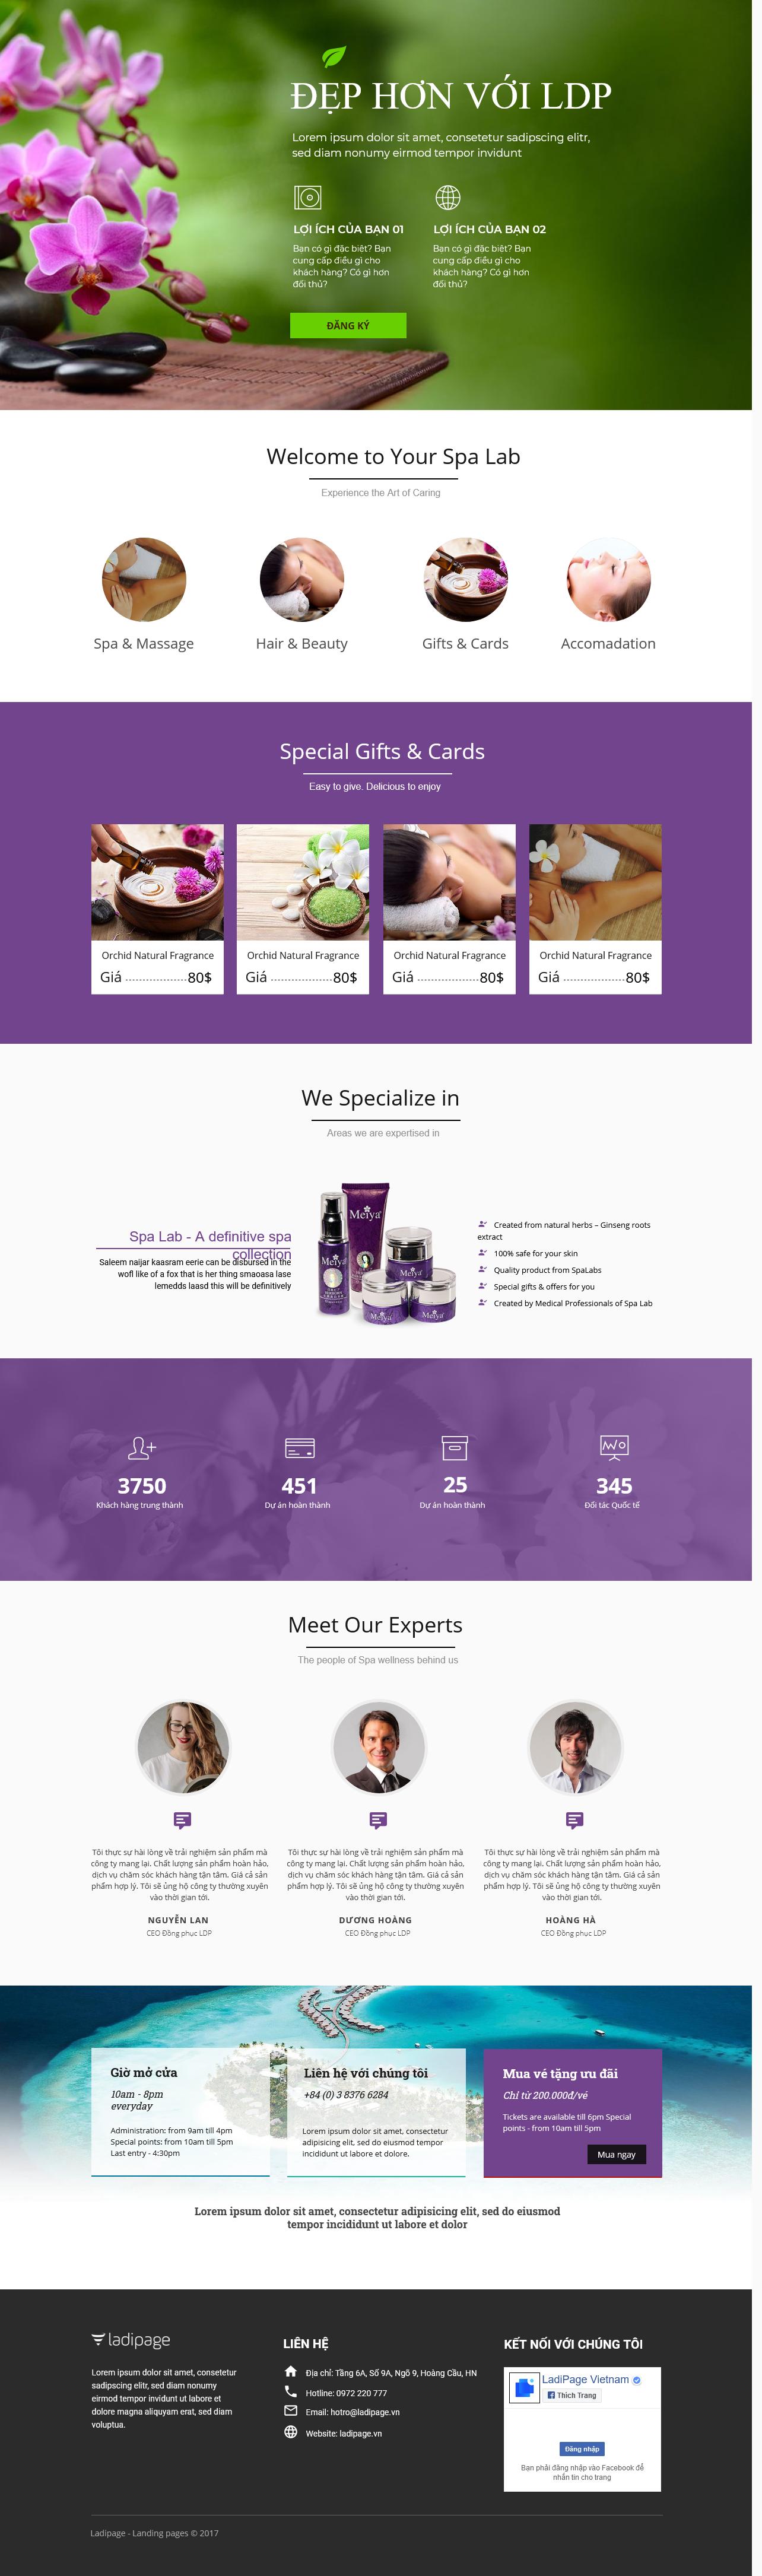 Thiết kế website Thiết kế webiste landingpage tham-my---spa---lam-dep Sức khỏe làm đẹp 25